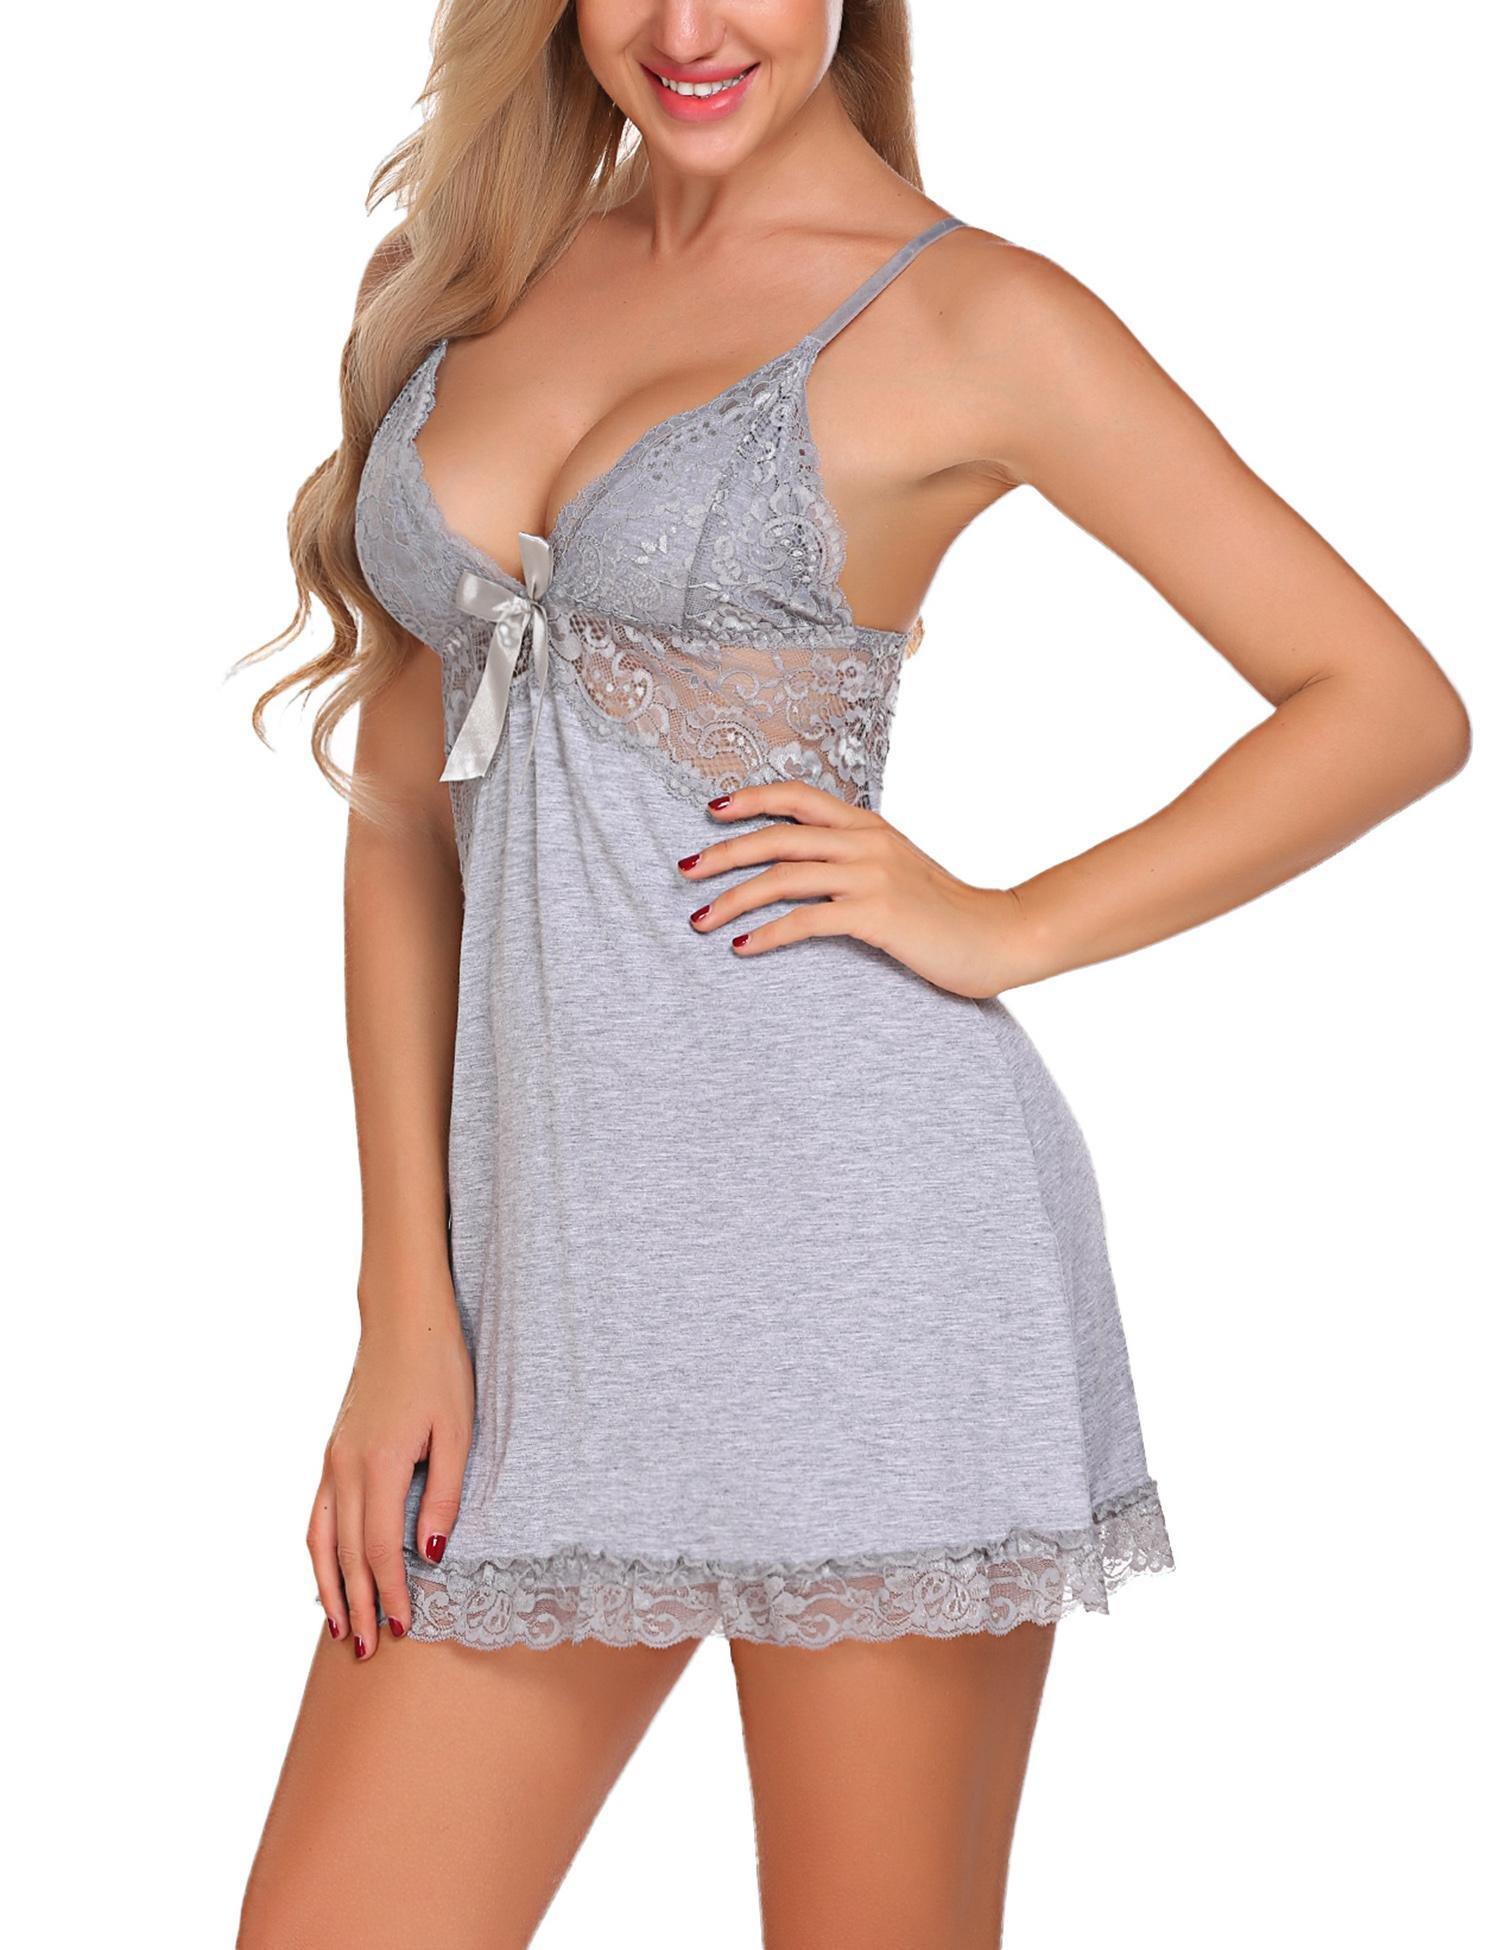 Avidlove Women Sexy Lingerie Slip V-Neck Chemise Nightgown Lace Babydoll Gray Small by Avidlove (Image #5)